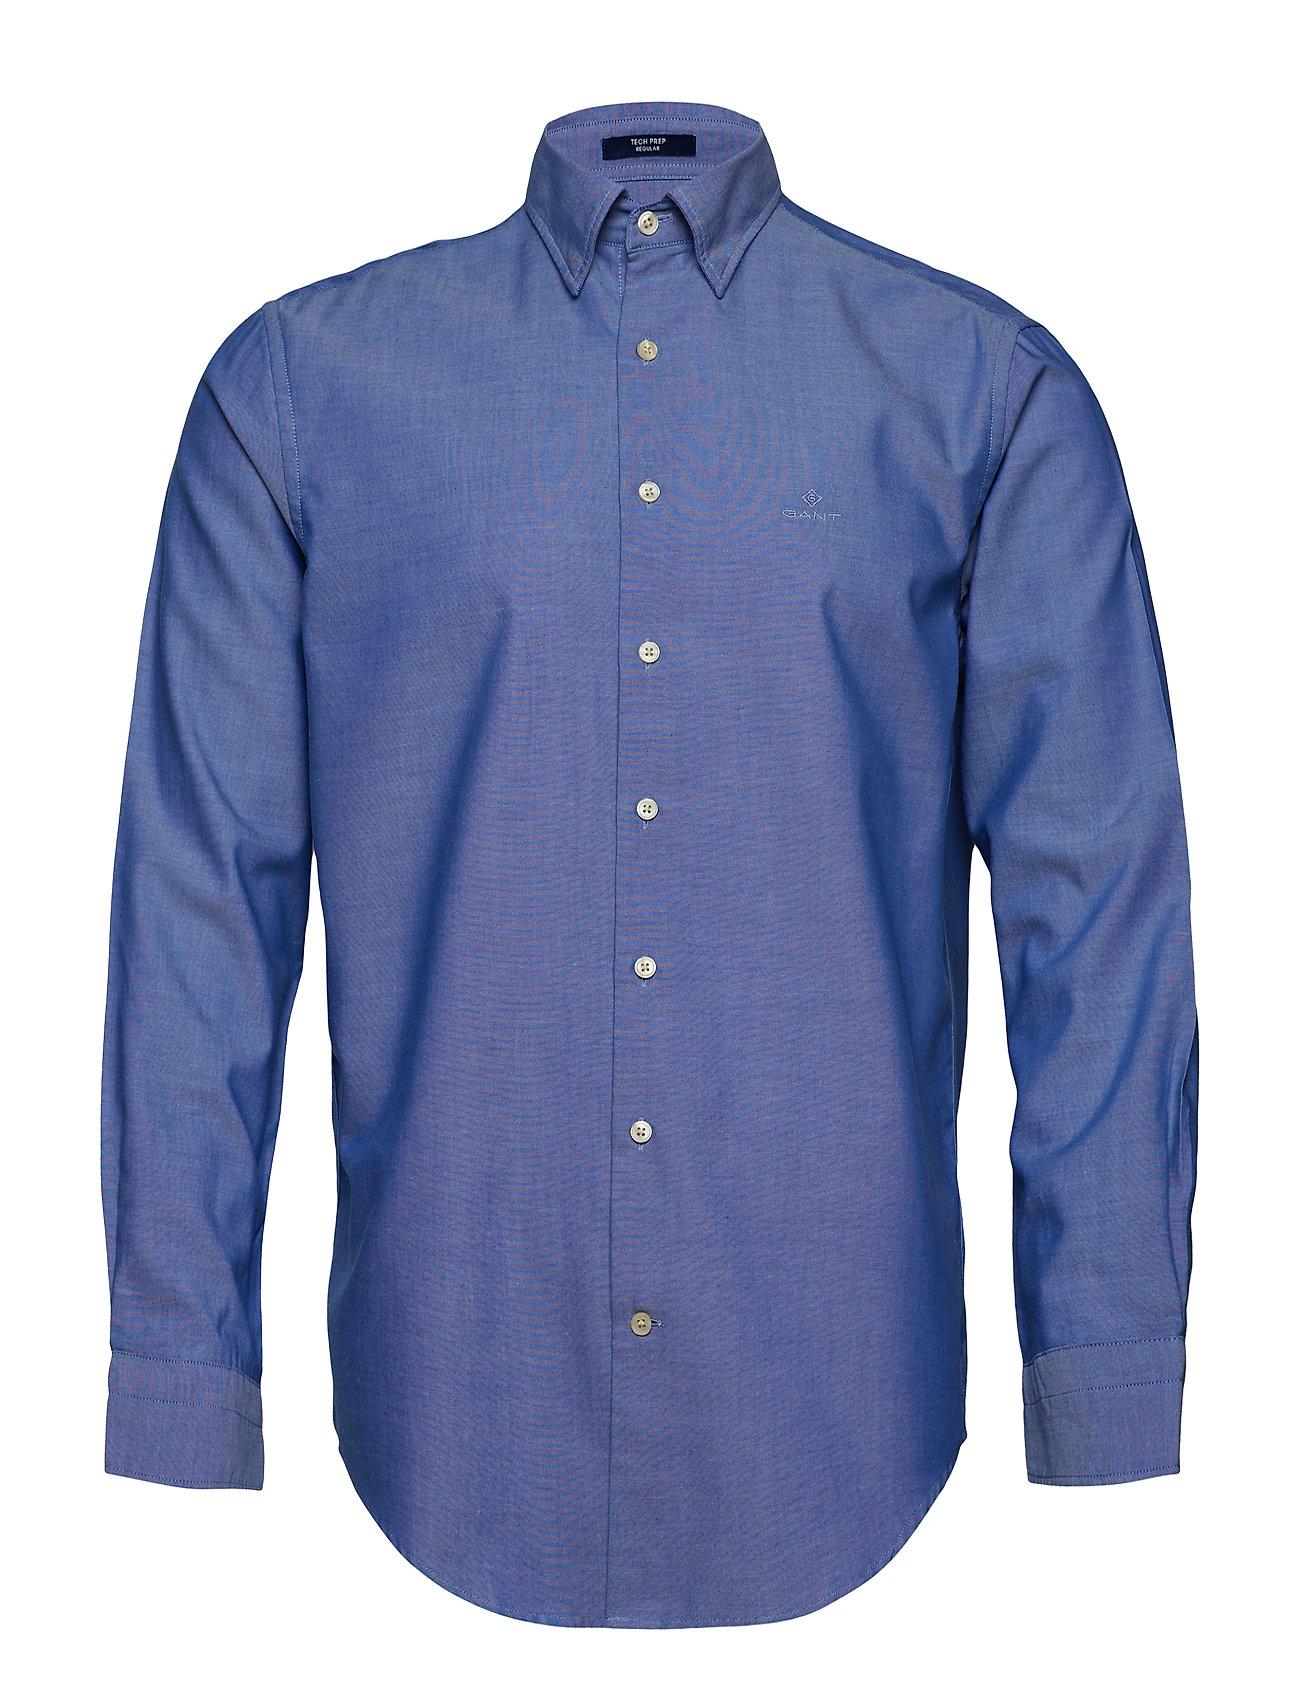 GANT Tp Oxford Plain Reg Hbd Hemd Business Blau GANT